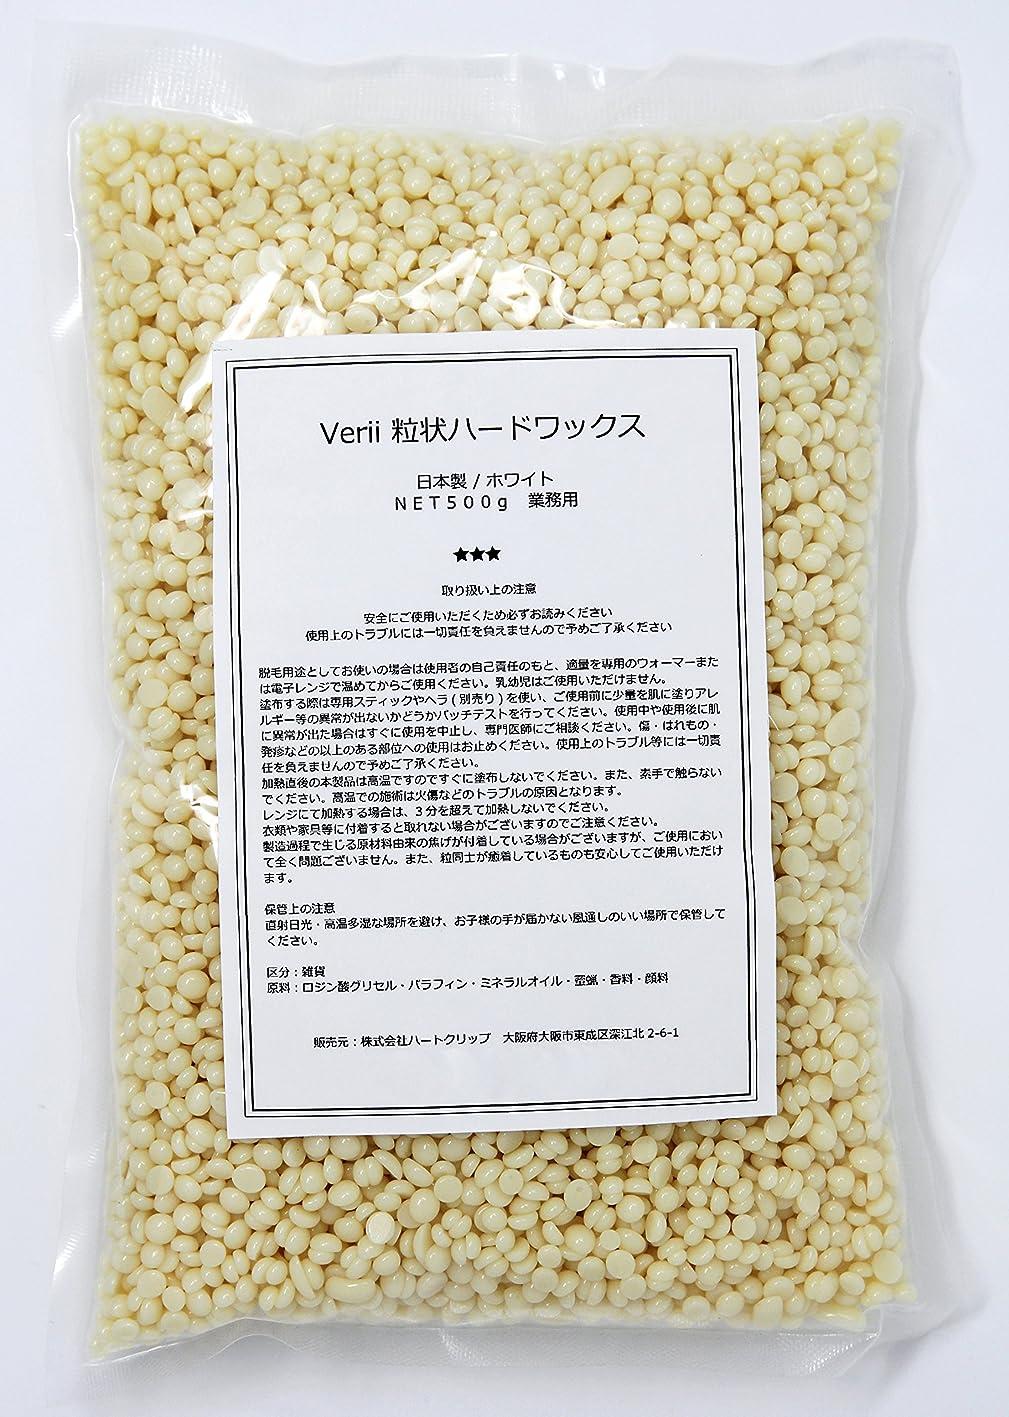 Verii 【鼻毛ワックス】粒状ハードワックス ホワイト (500g)